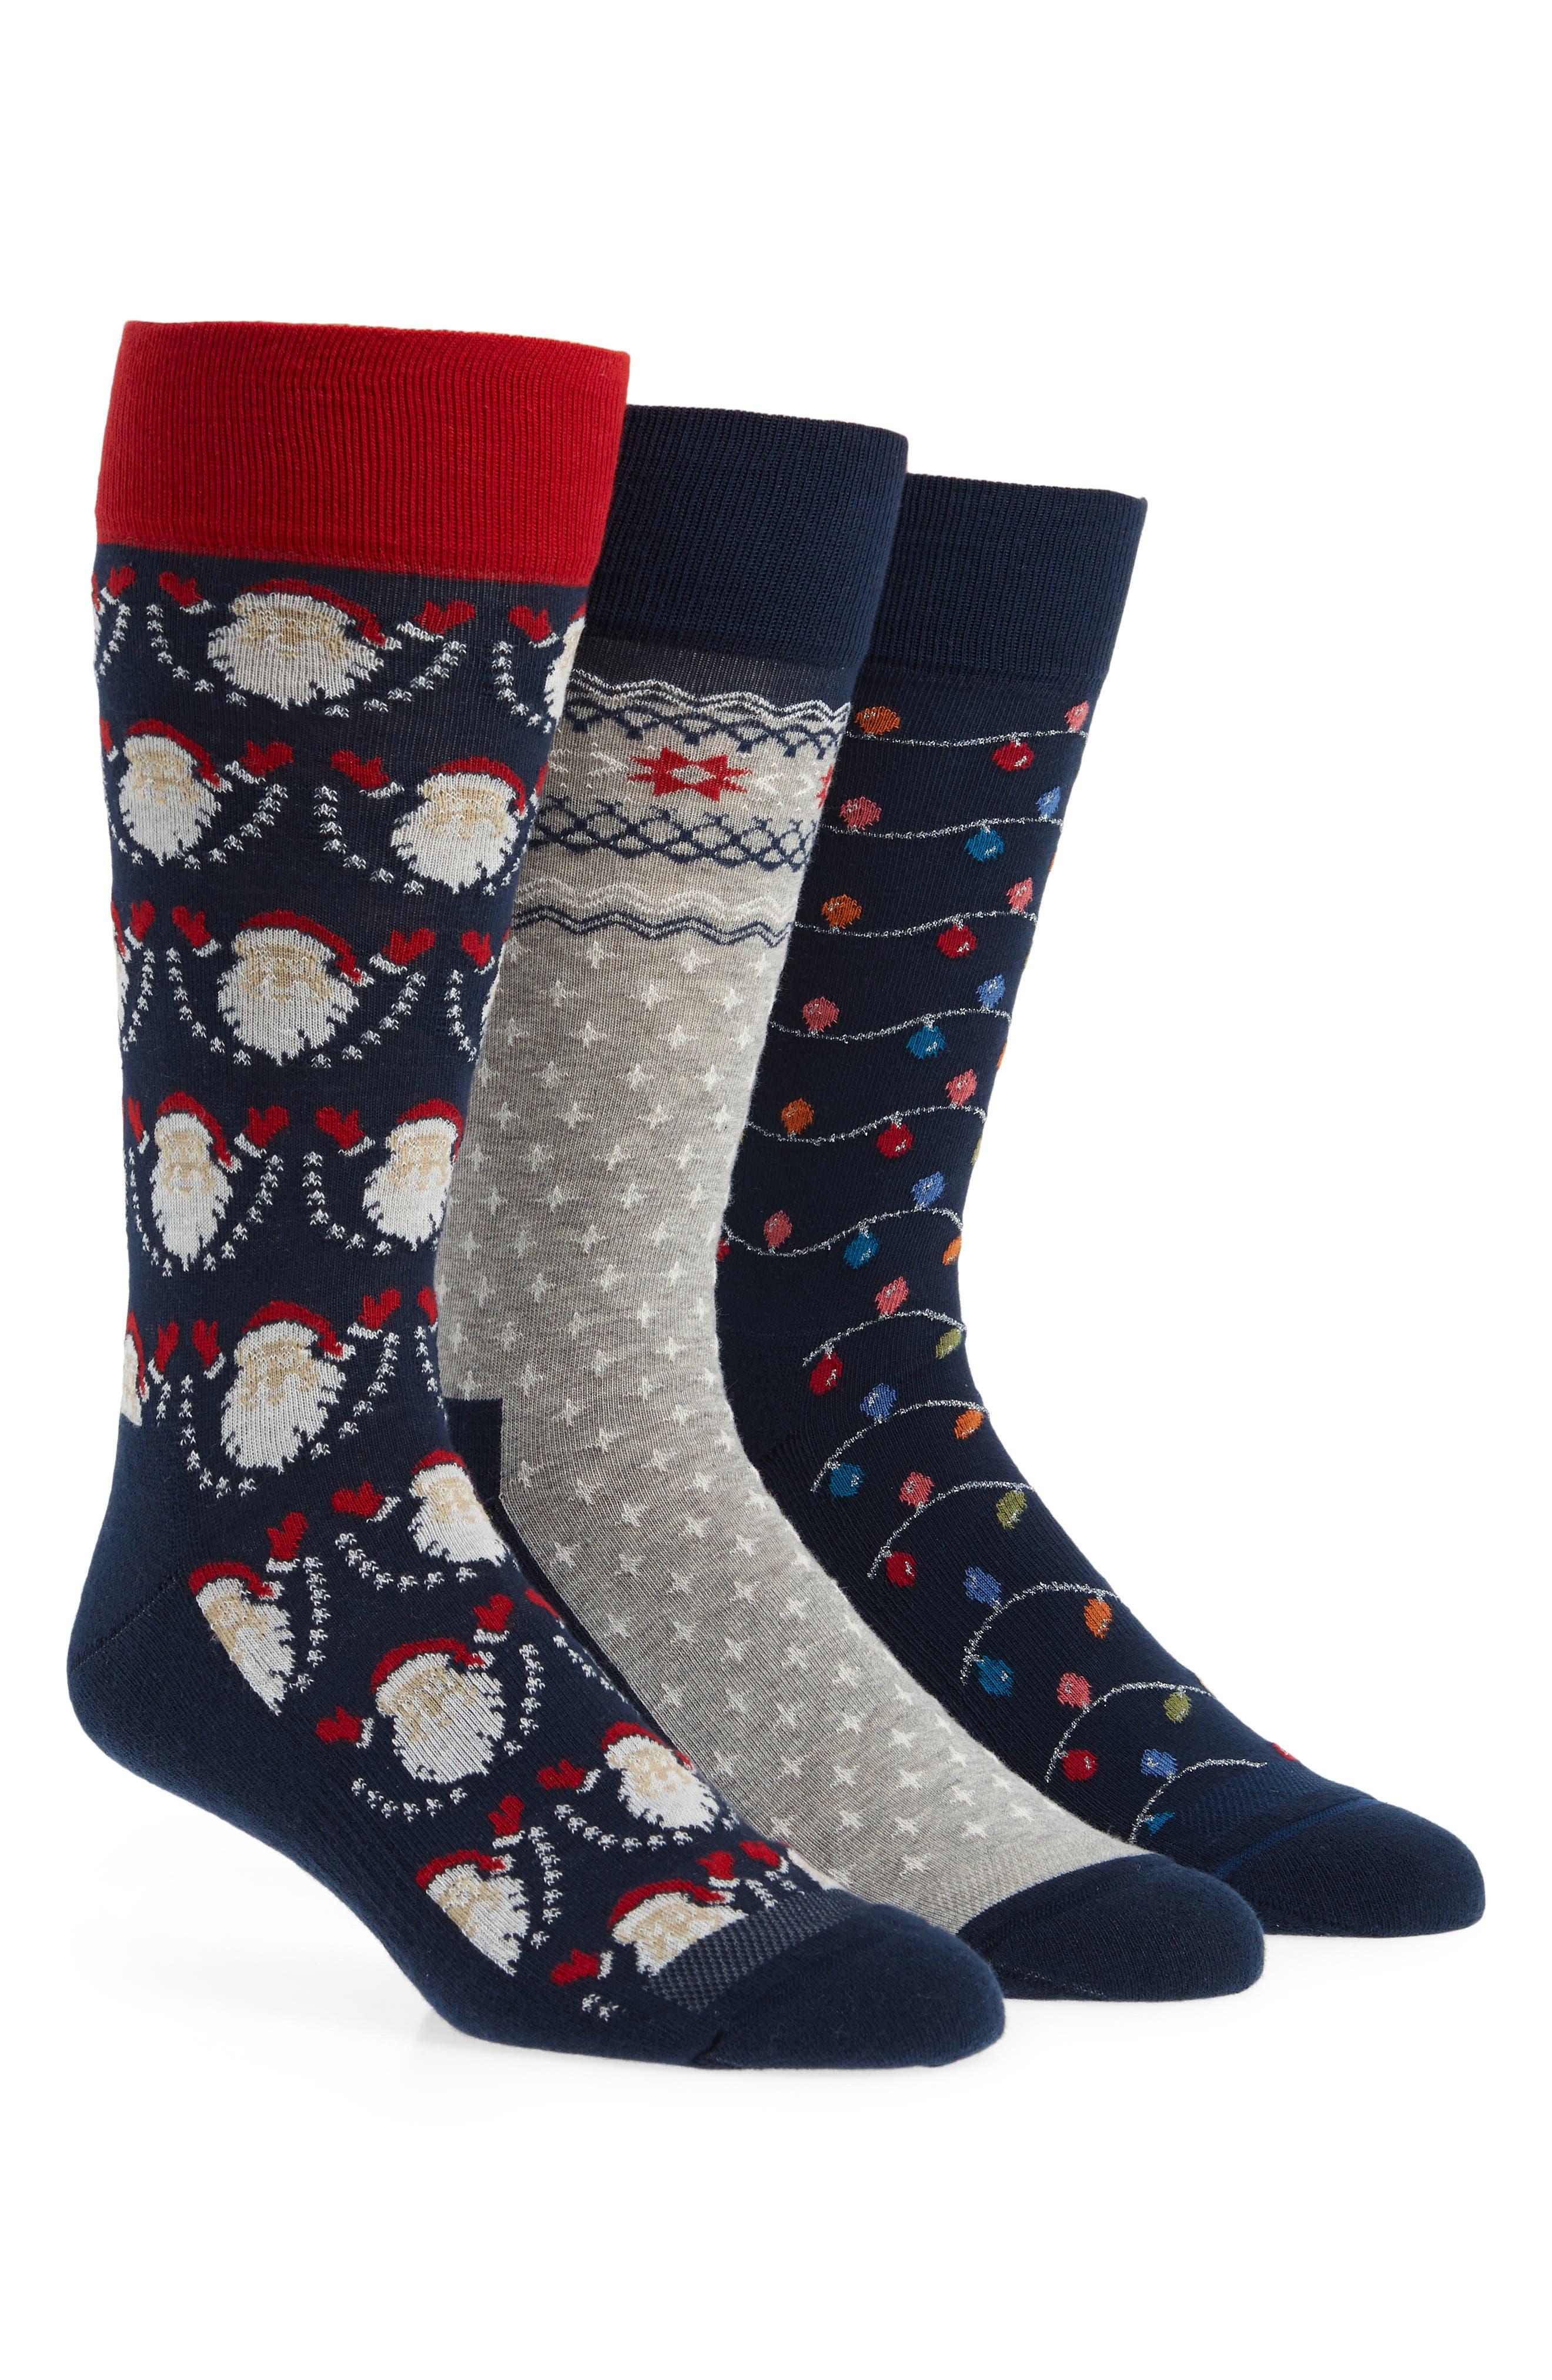 3-Pack Holiday Novelty Socks Box Set,                         Main,                         color, SANTA/ FAIRISLE/ LIGHTS